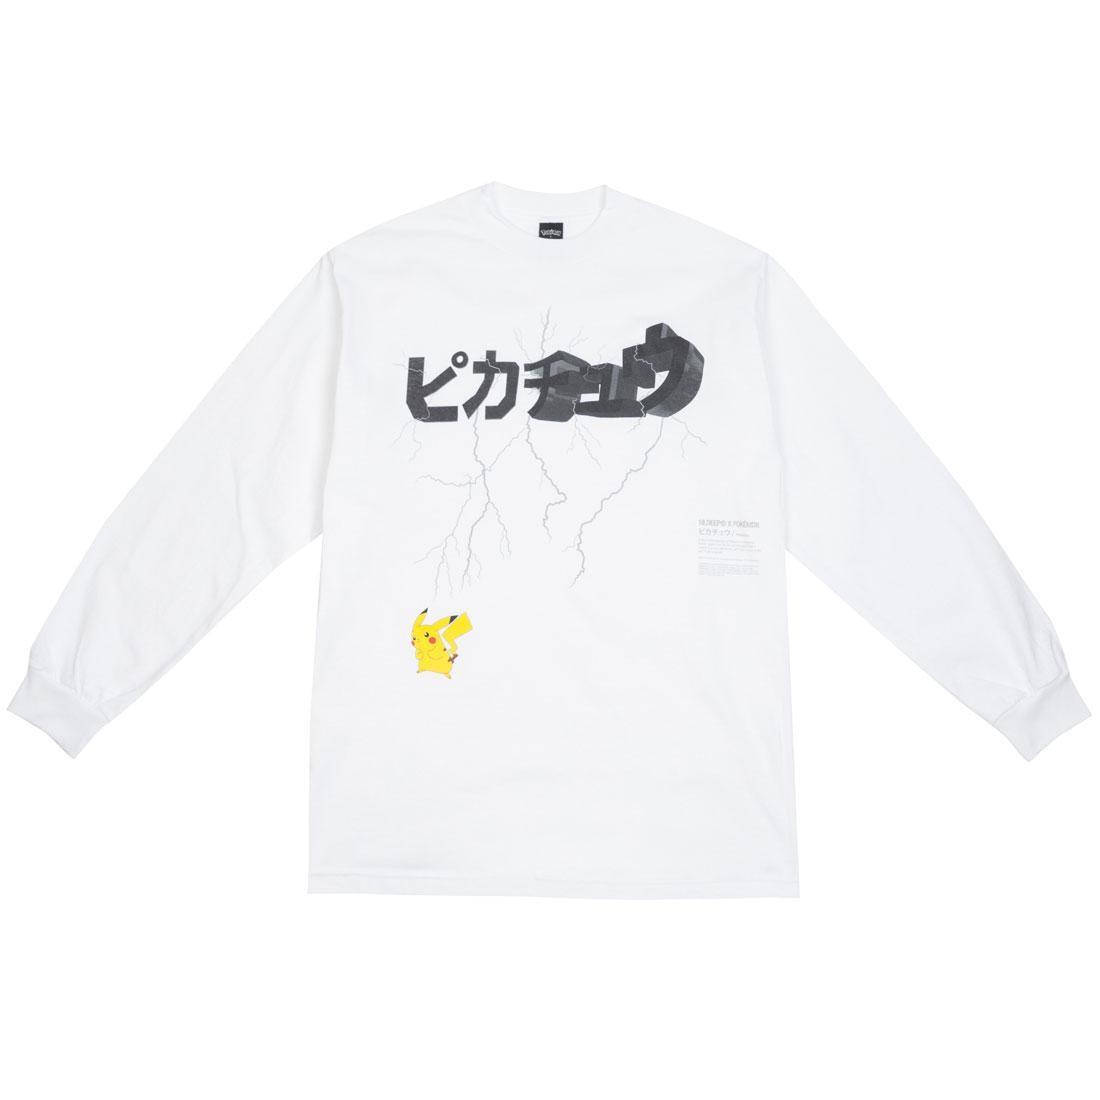 BAIT Exclusive 10 Deep x Pokemon Men Lightning Strike Long Sleeve Tee (white)